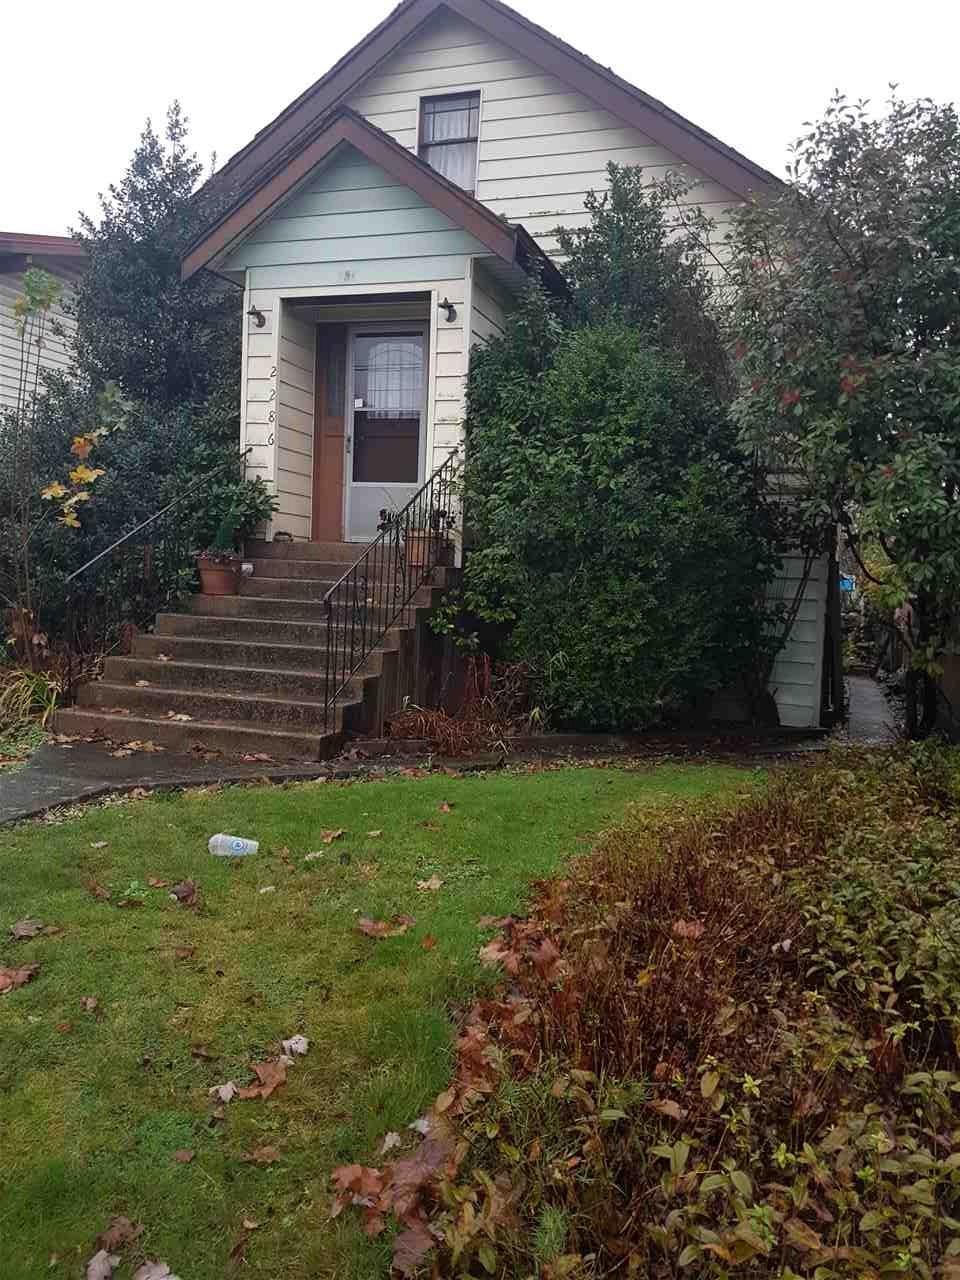 2286 E BROADWAY AVENUE, Vancouver, BC V5N 1W9